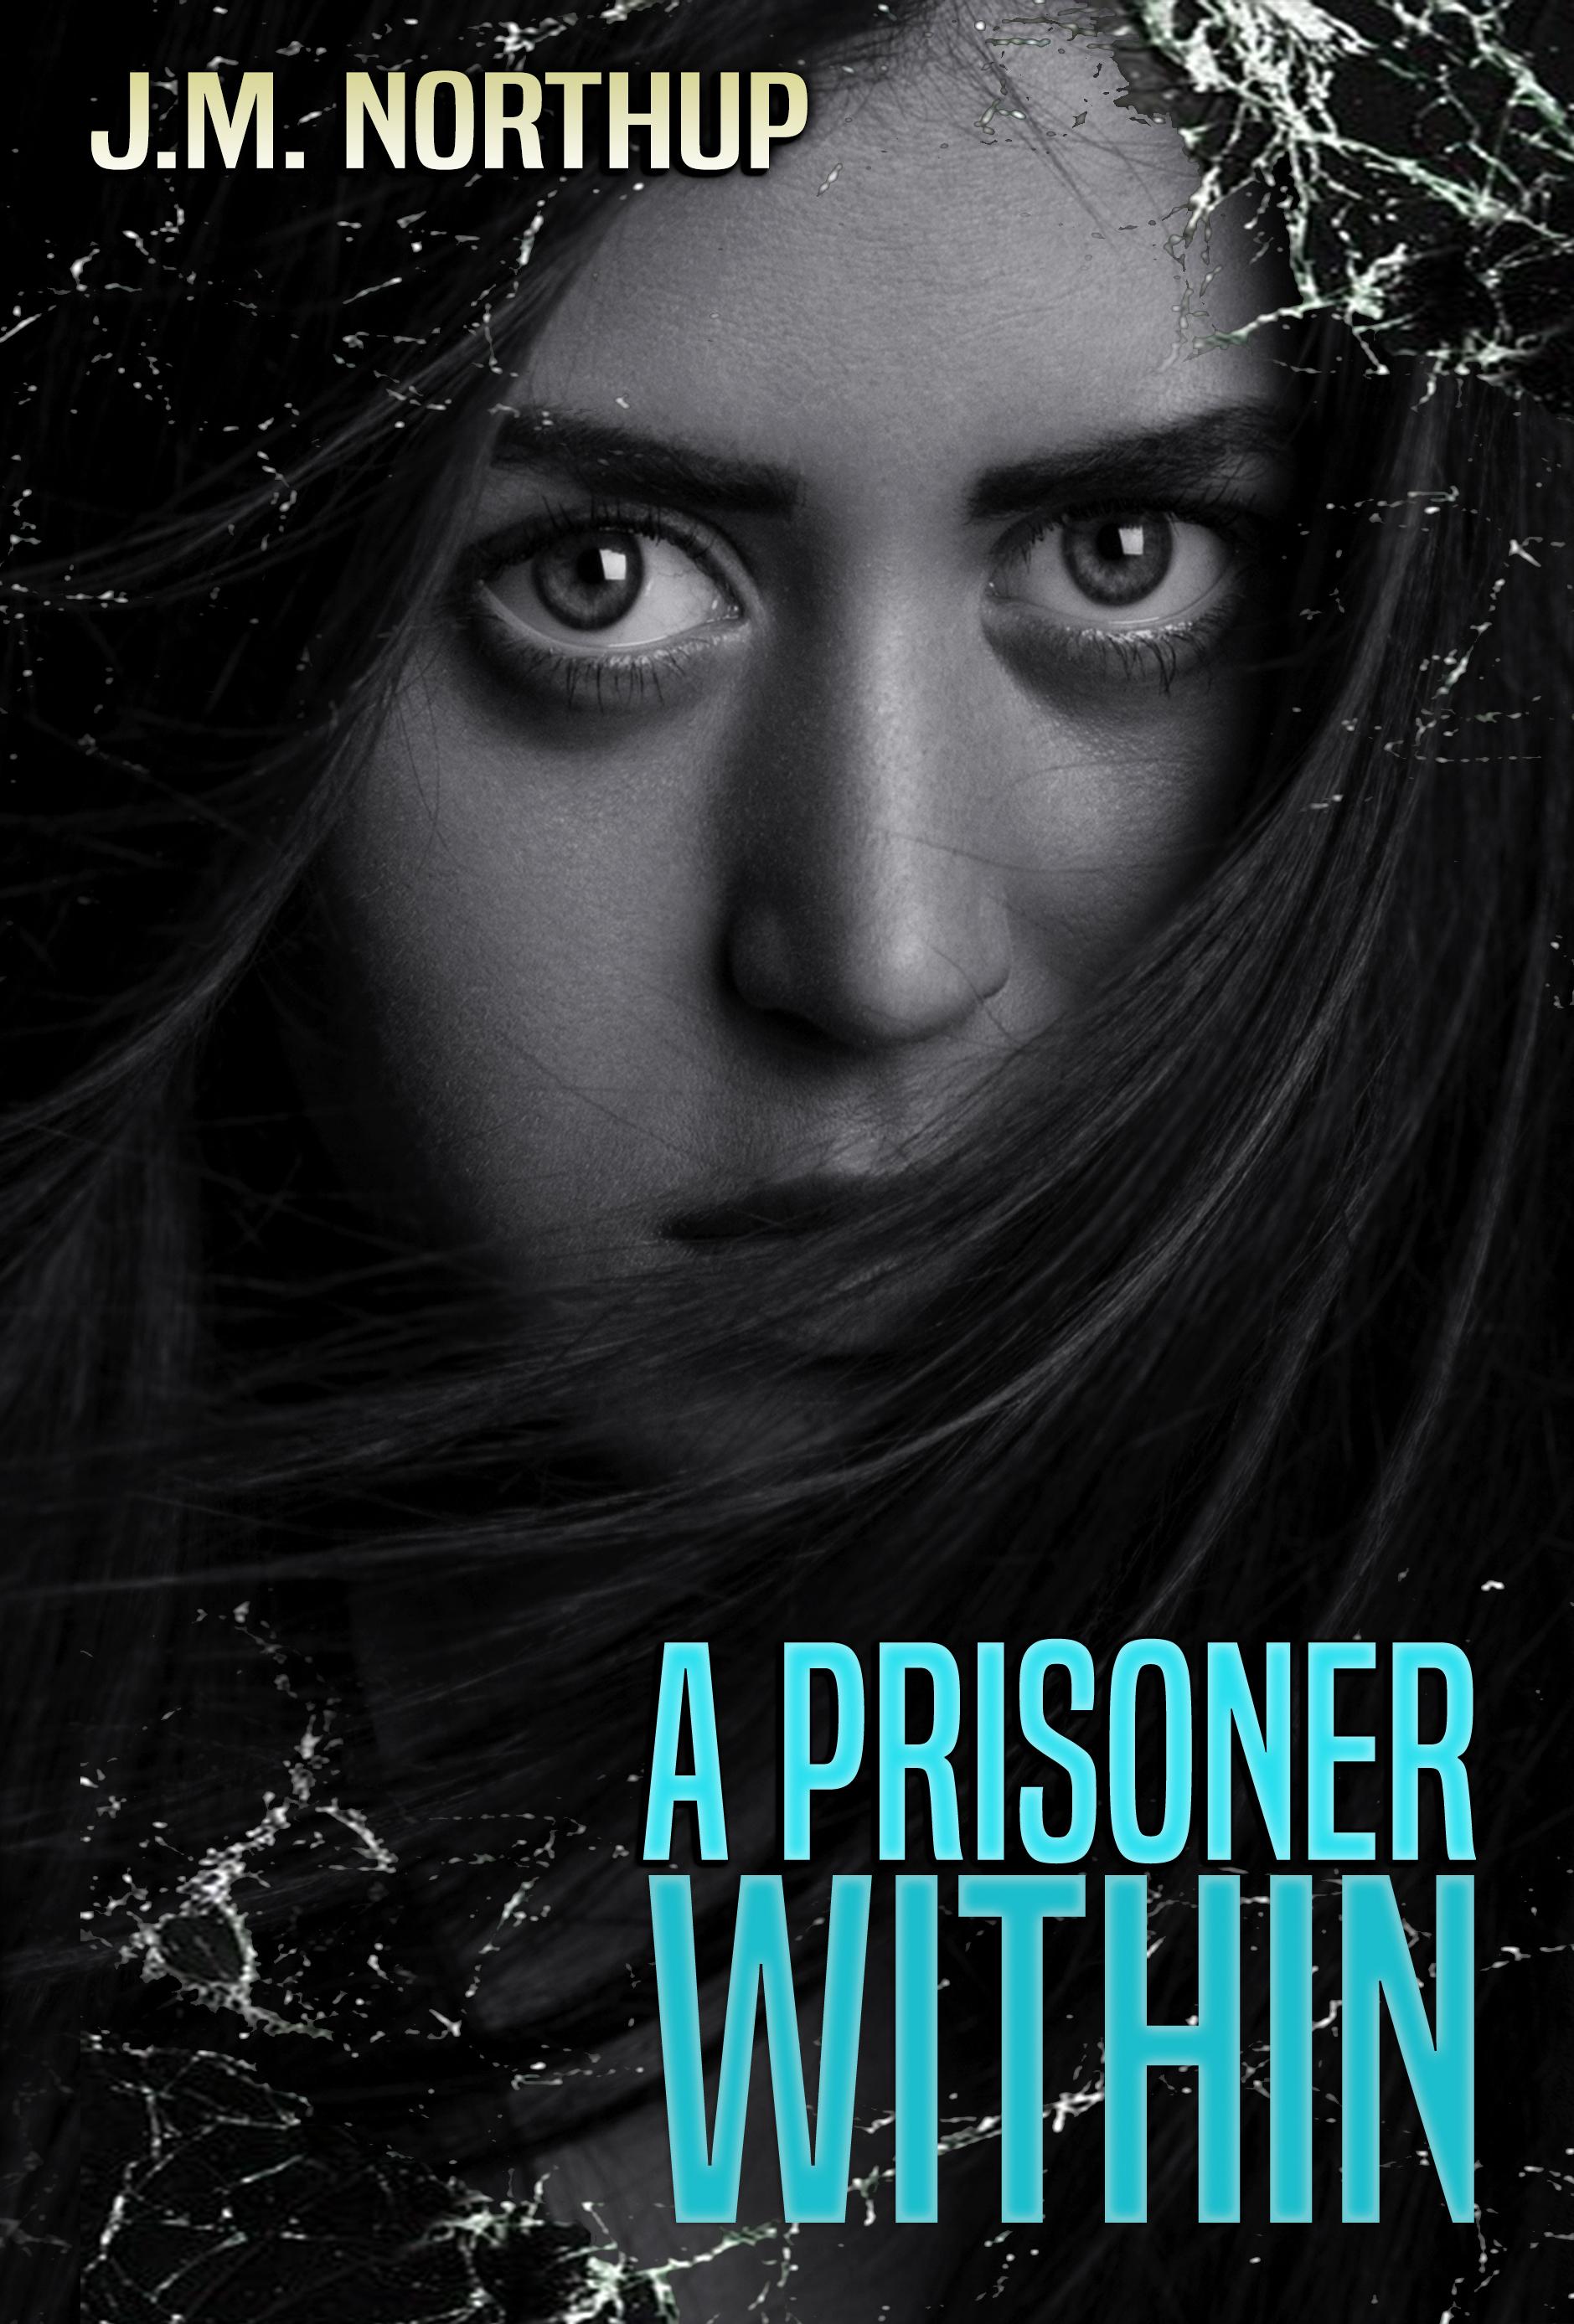 JMN - Prisoner Within Wrap FINAL-003.jpg